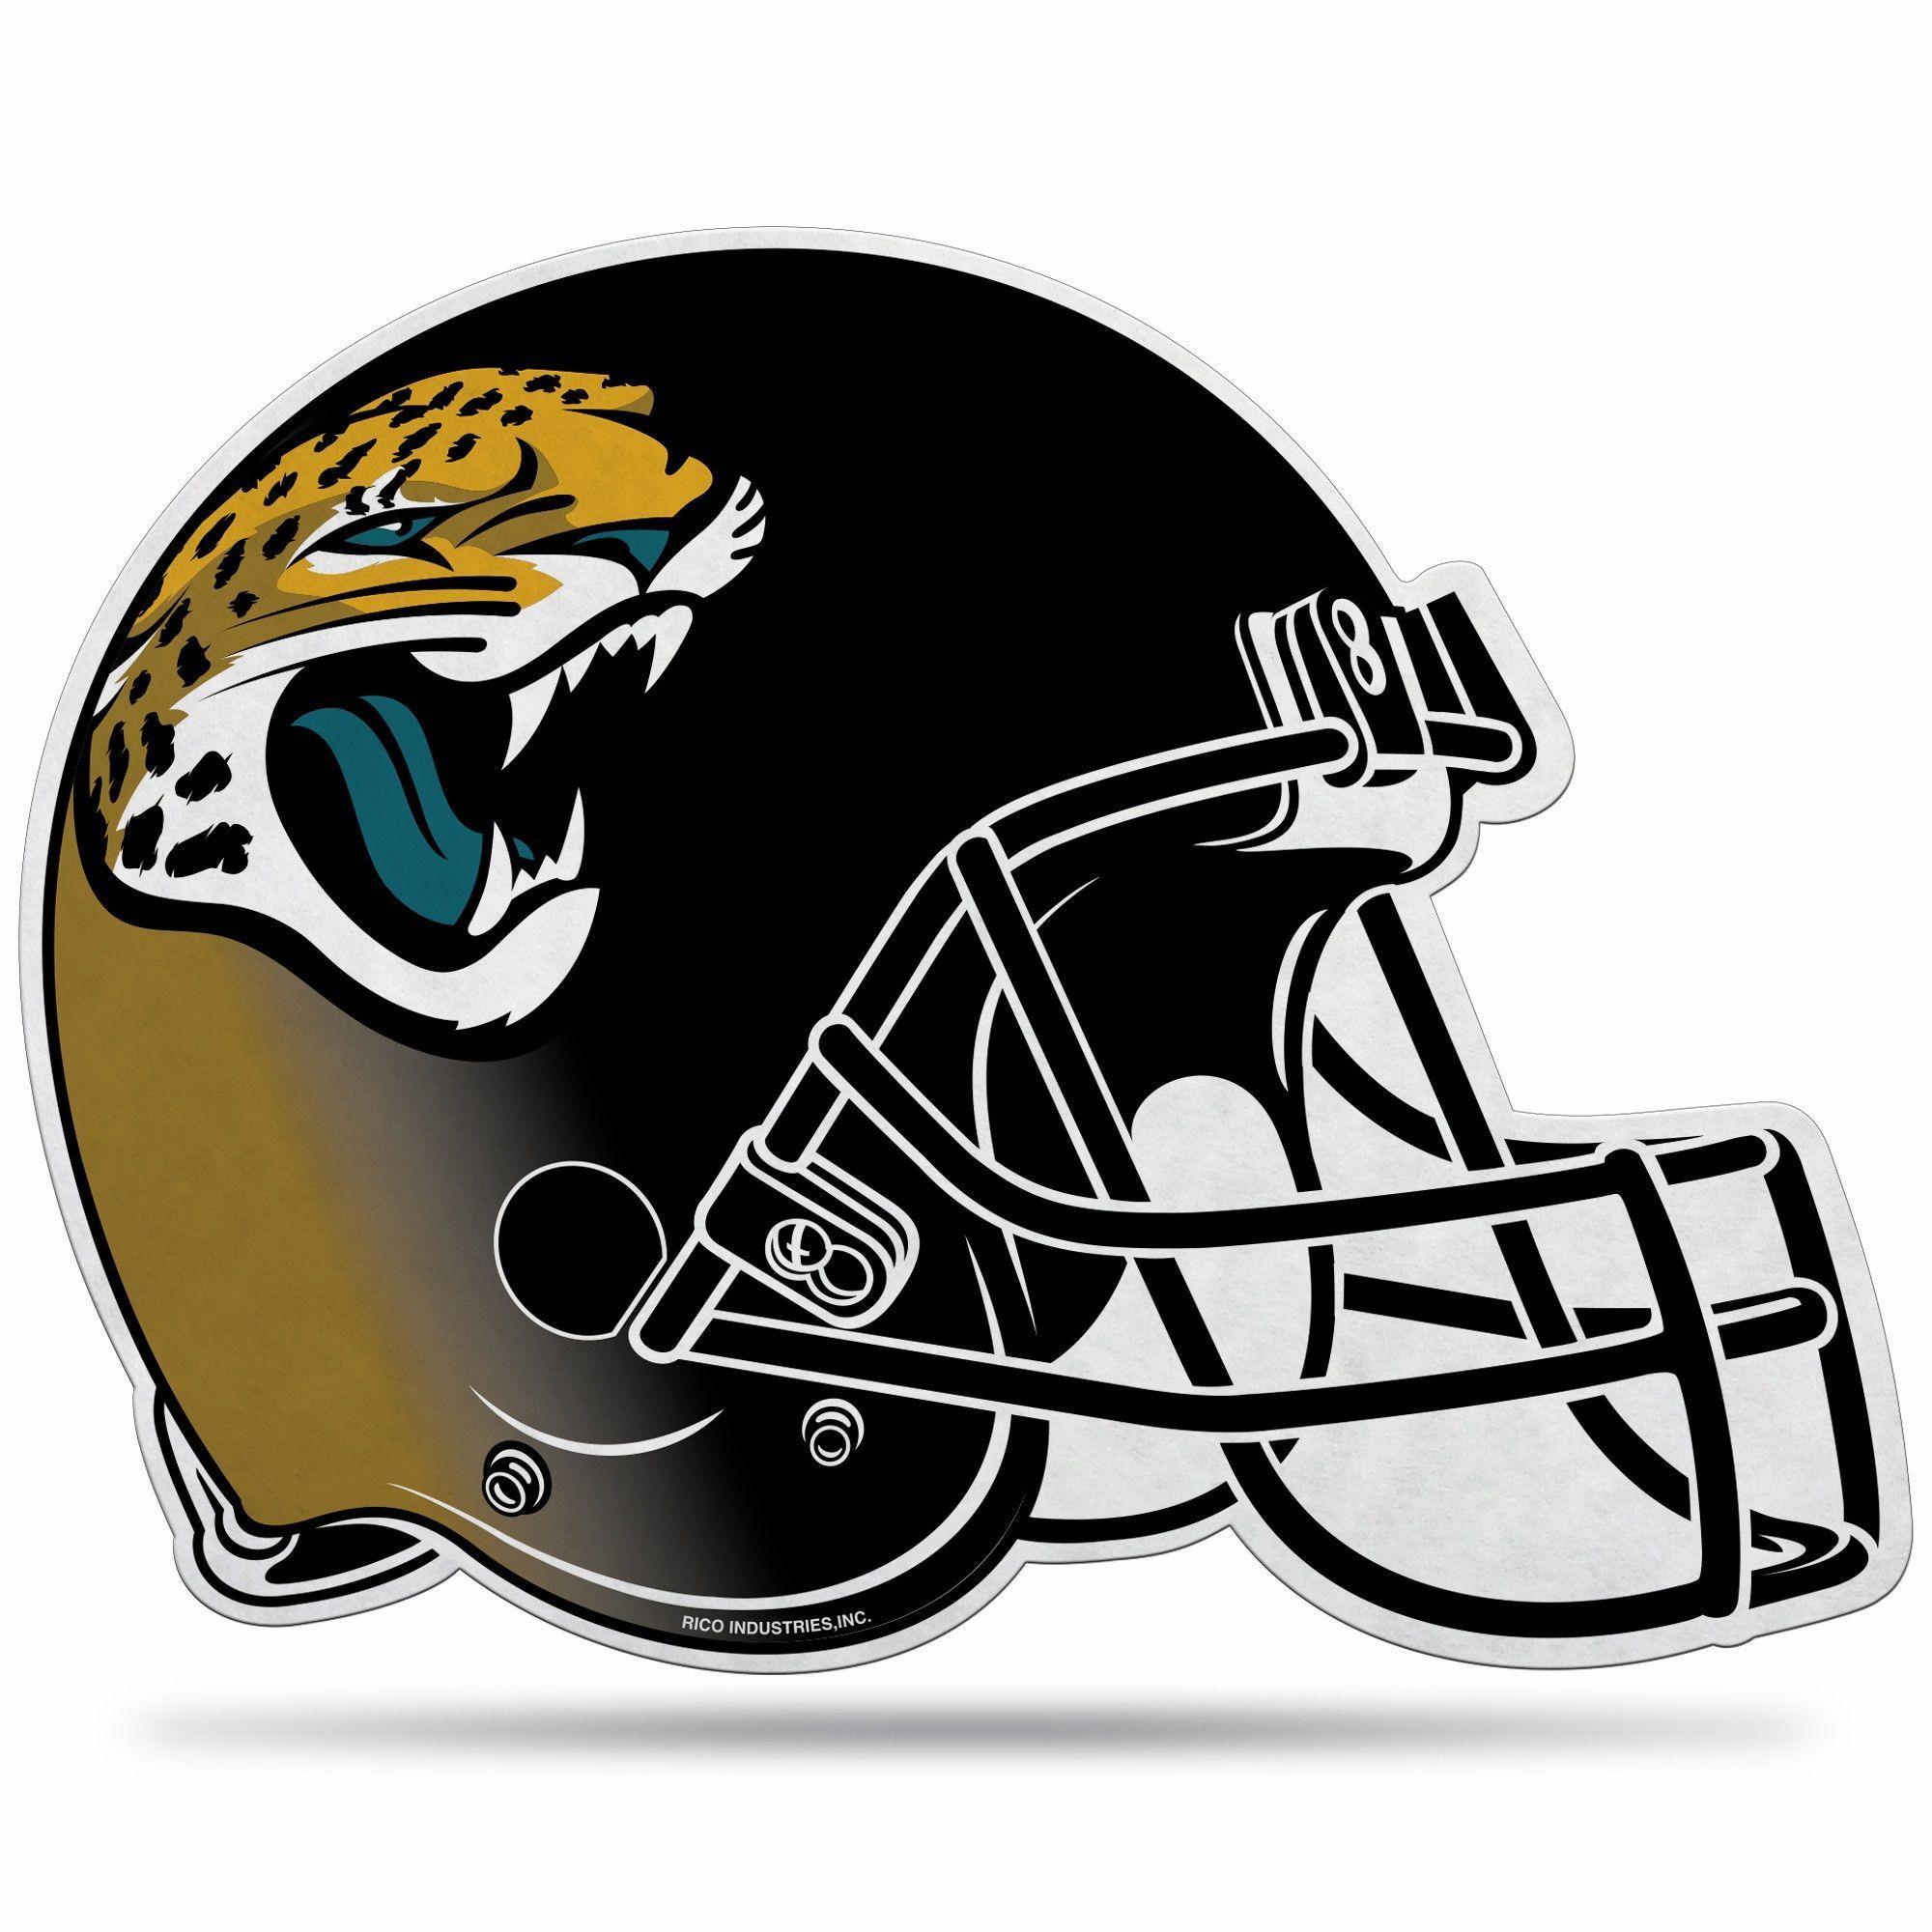 Jacksonville Jaguars Helmet Die-Cut Pennant | Products | Pinterest